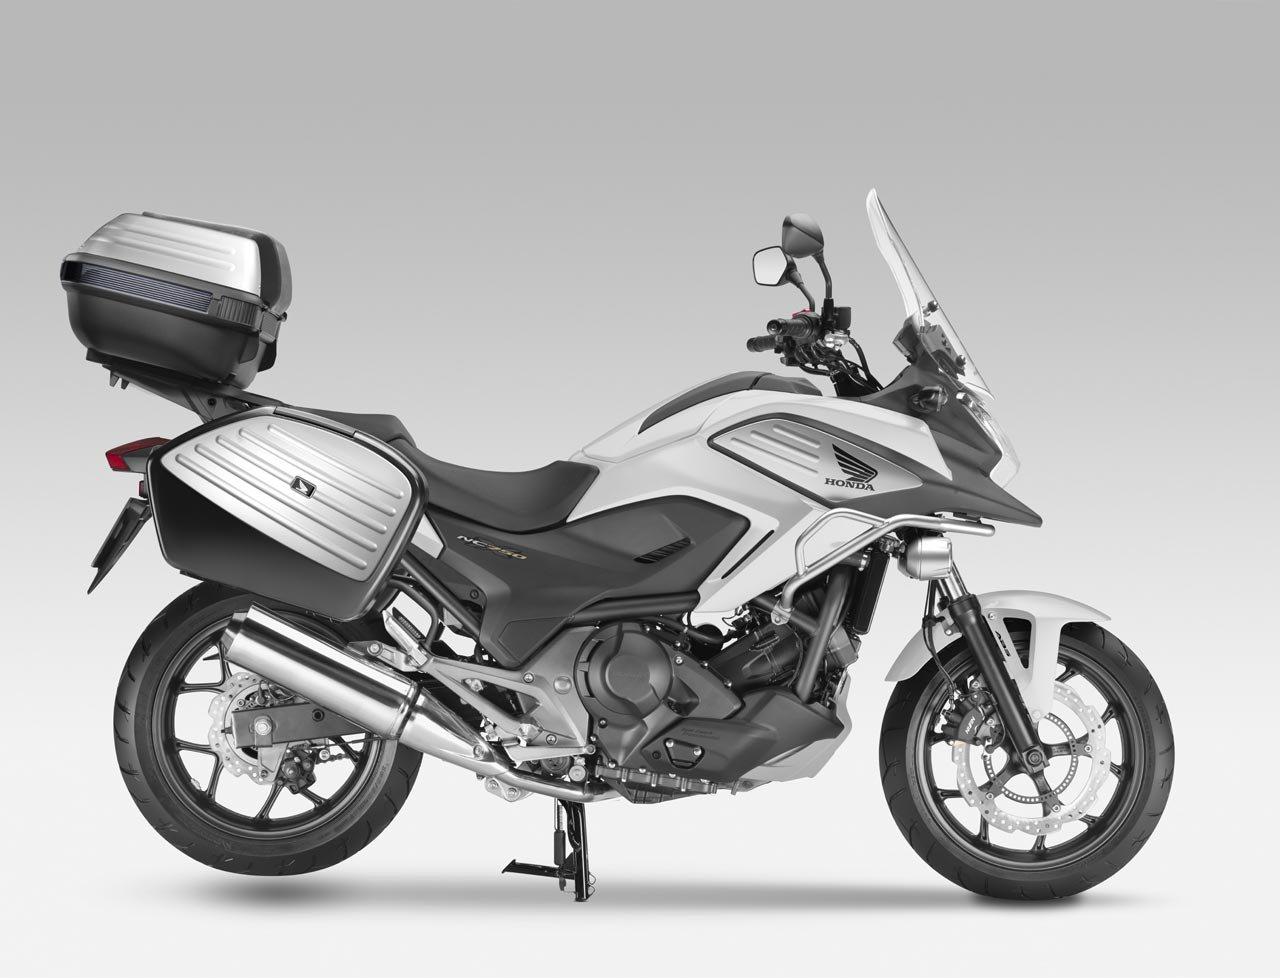 Listino Honda CB 650 F Naked Media - image 13506_1 on http://moto.motori.net